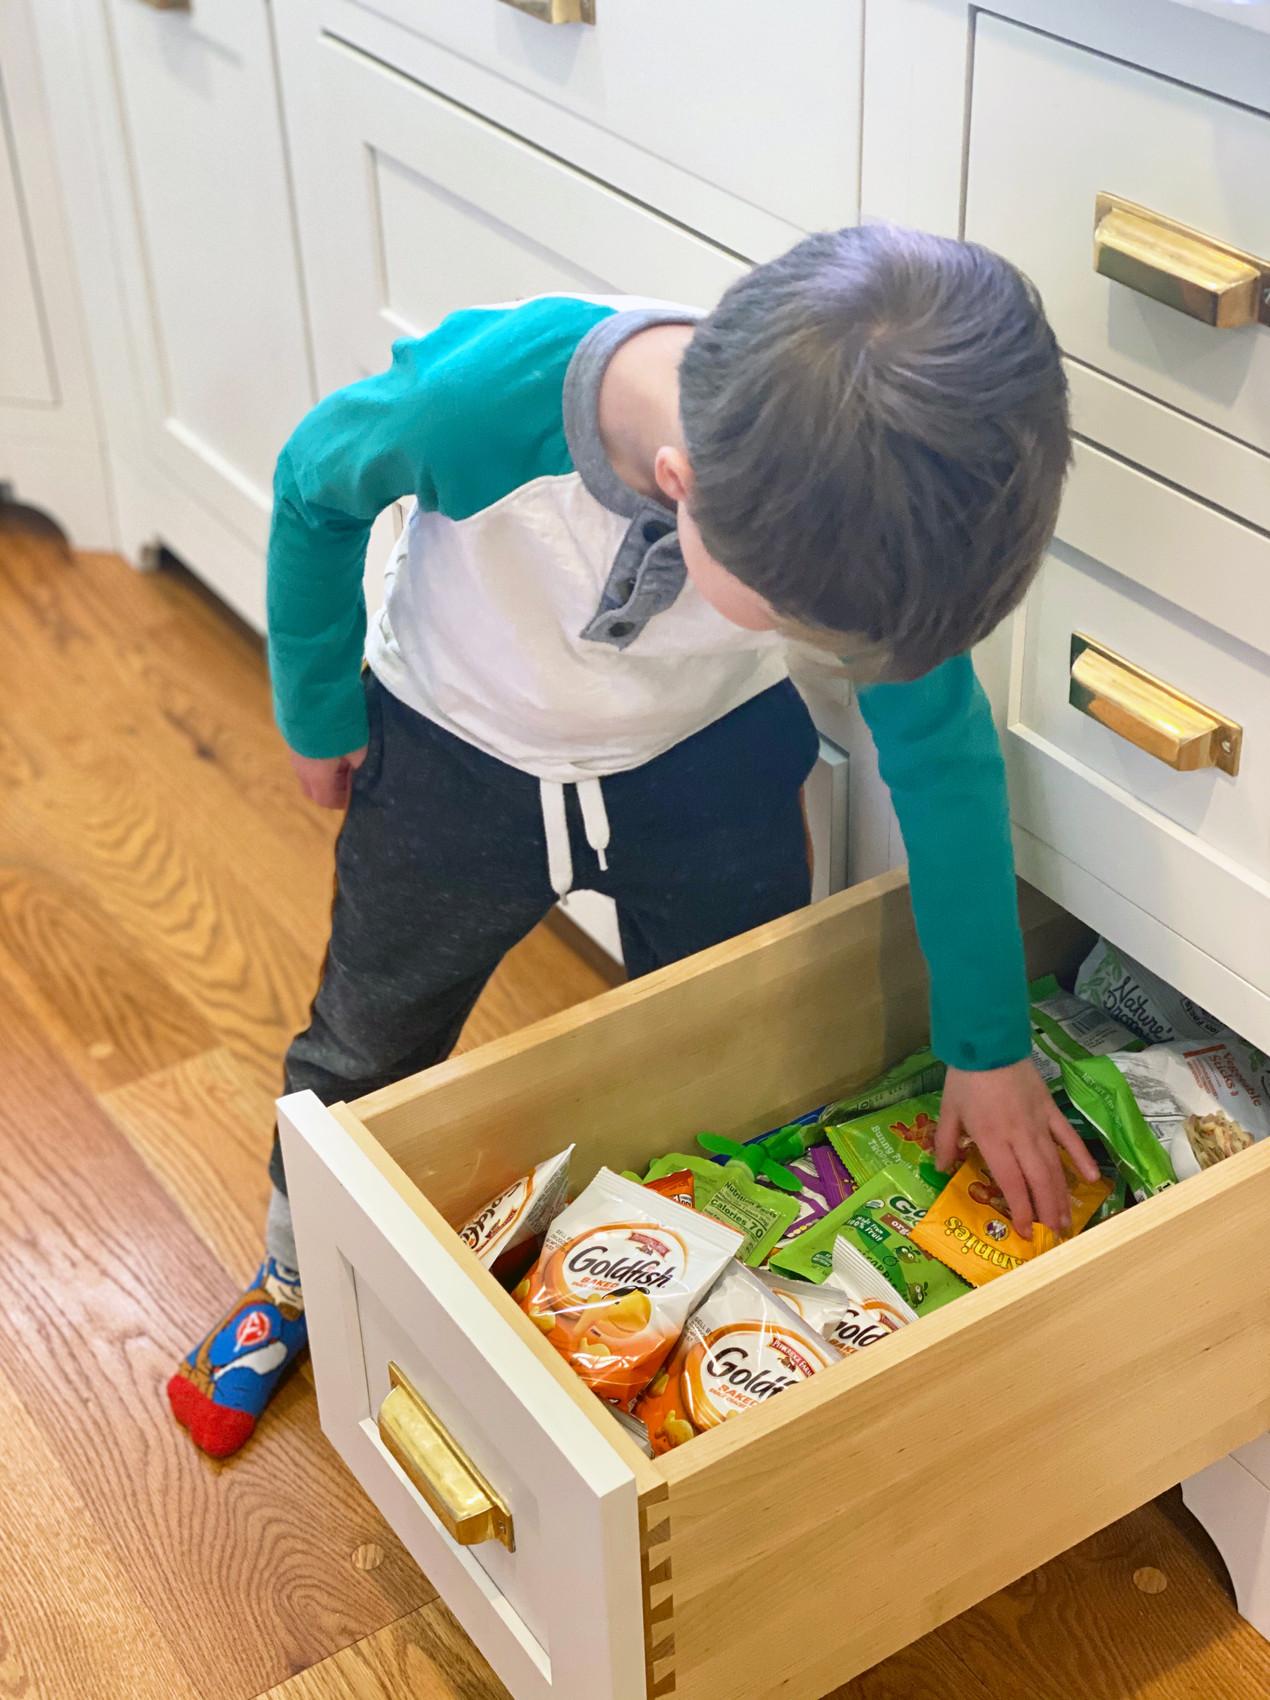 rye modern tudor, snack drawer, kids independence fridge, family friendly design